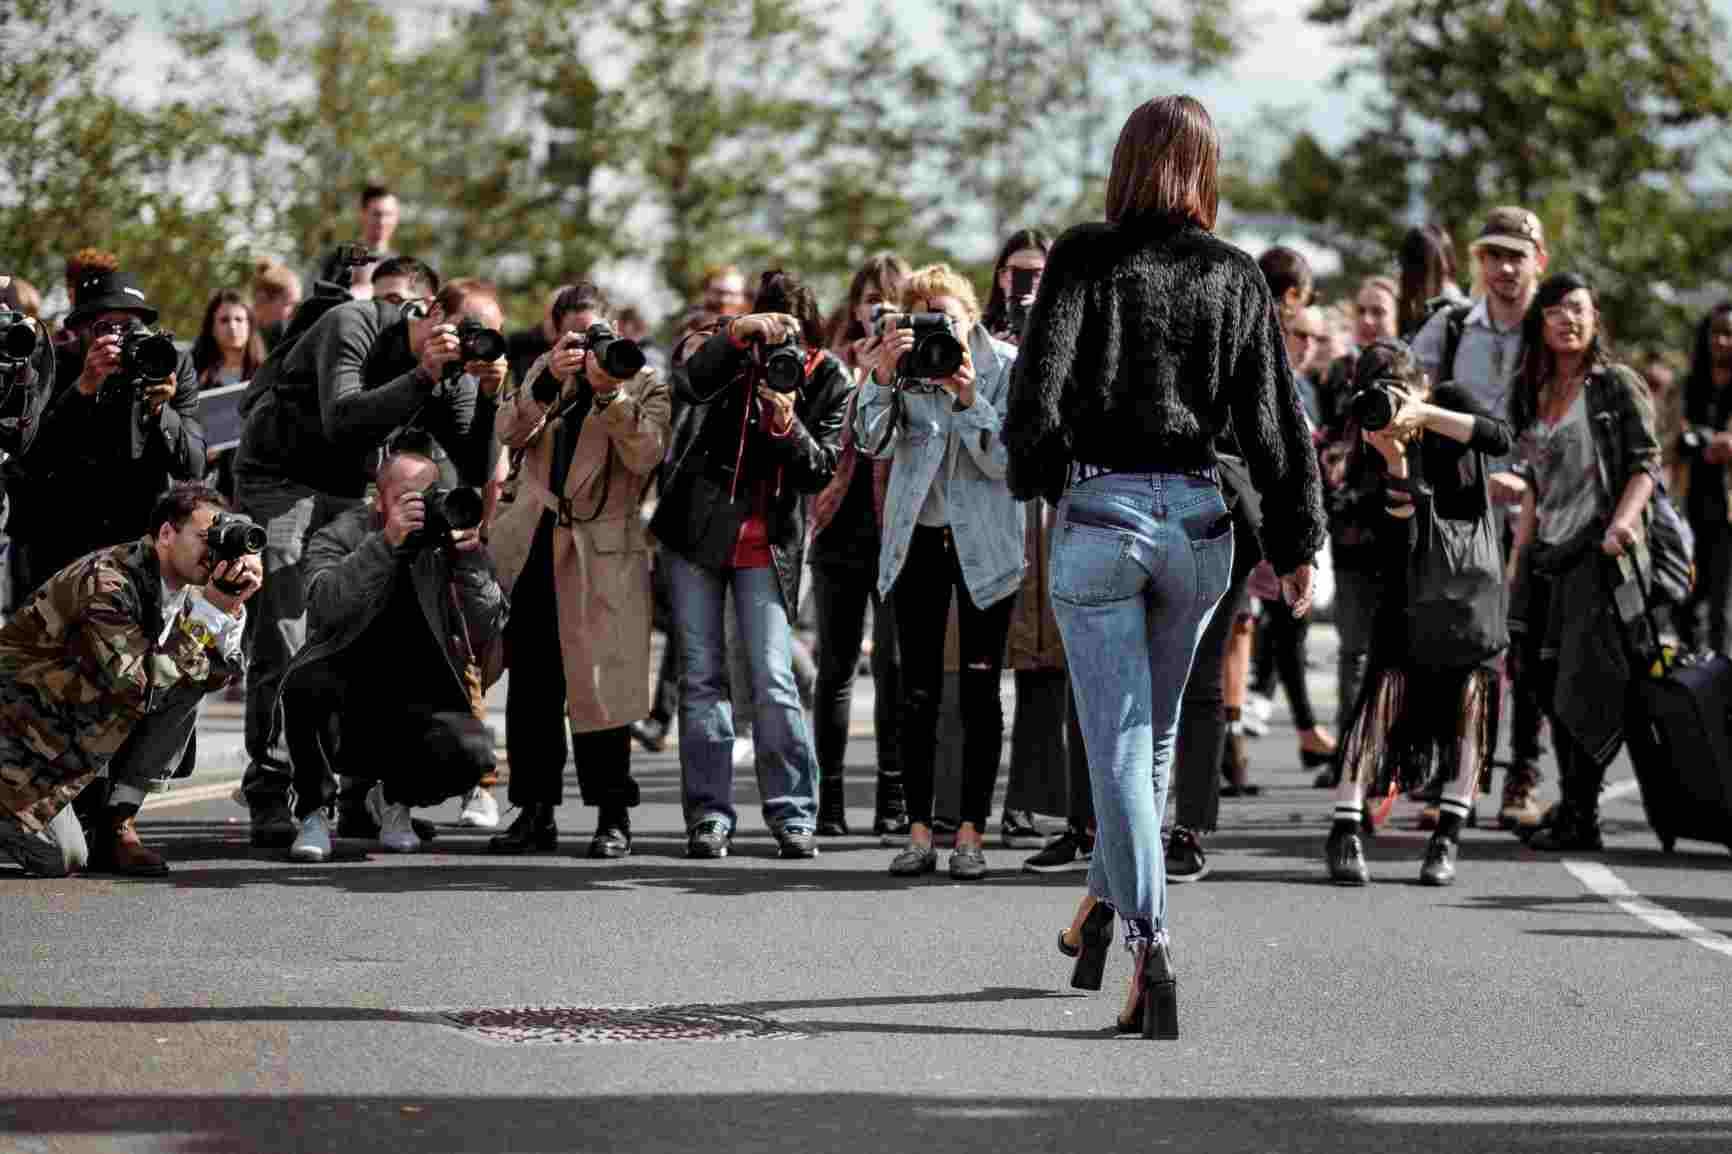 paparazzi and celebrity